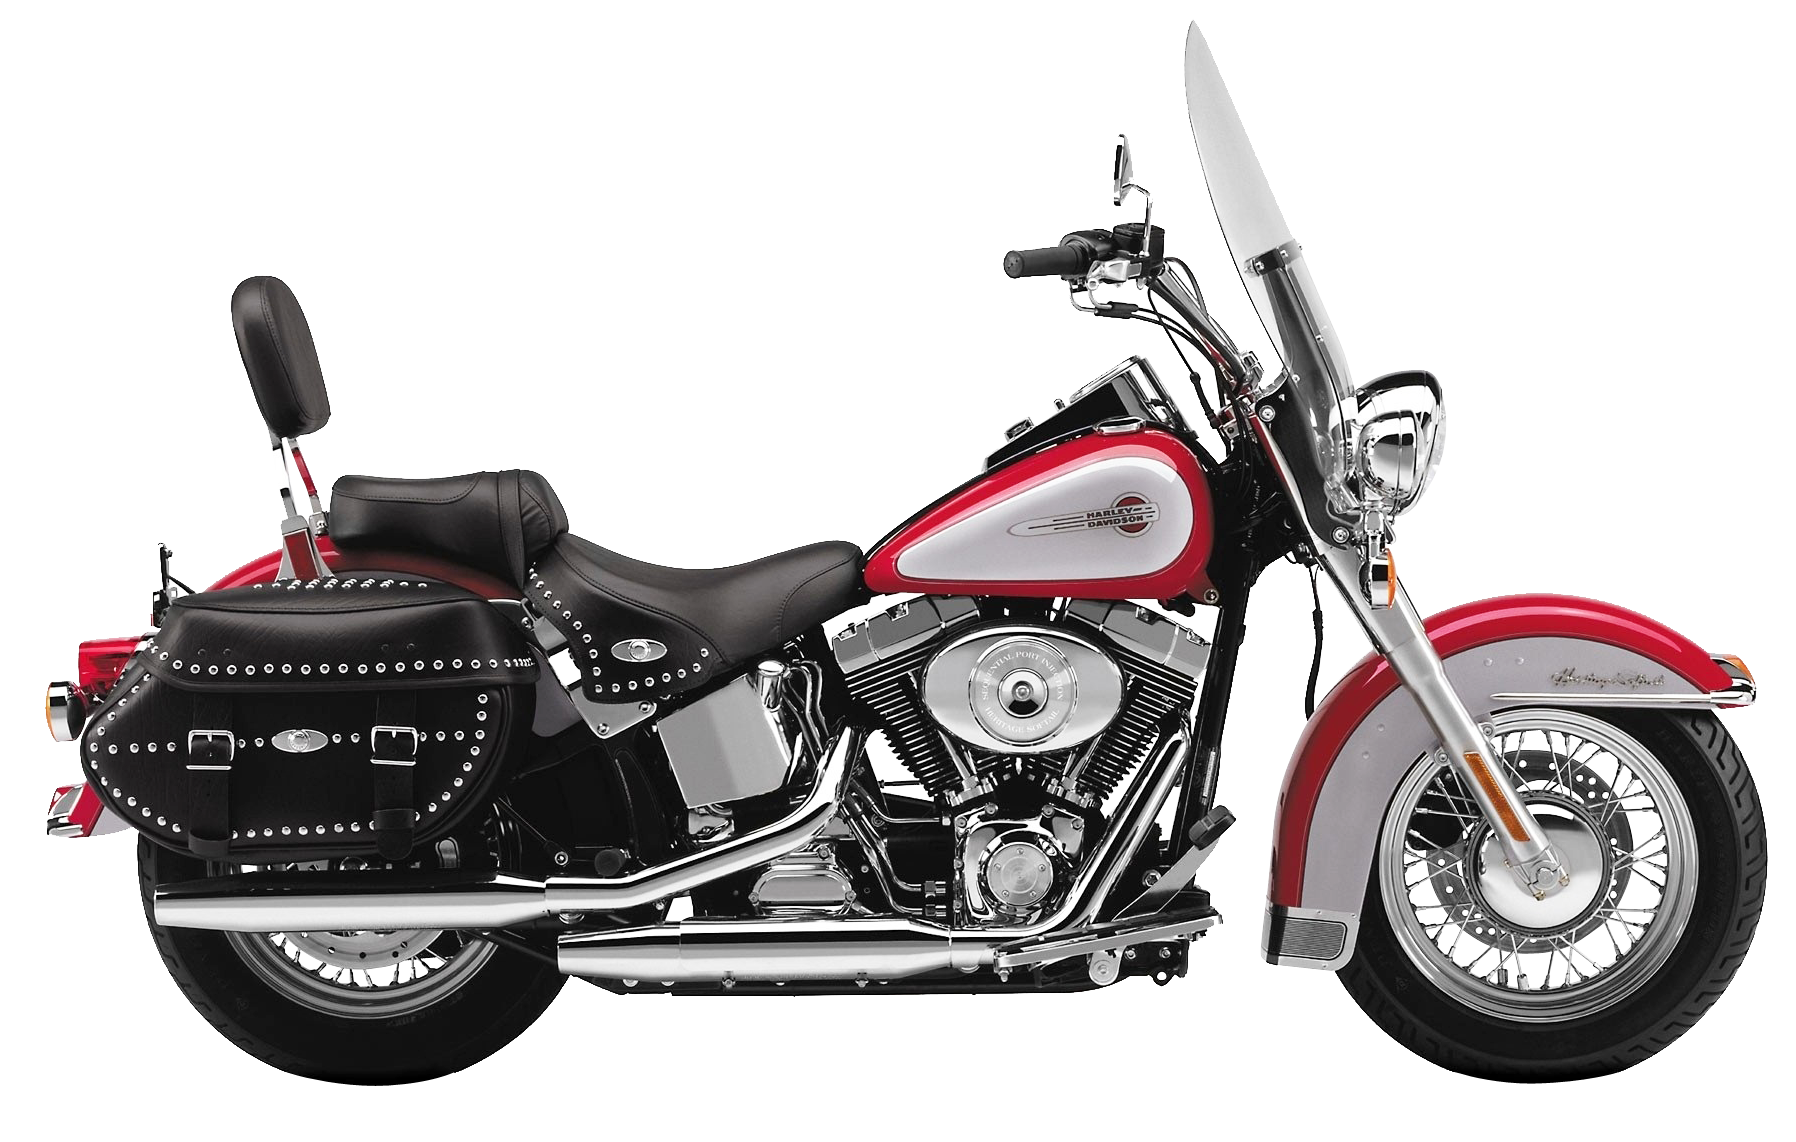 Red Harley Davidson PNG Image